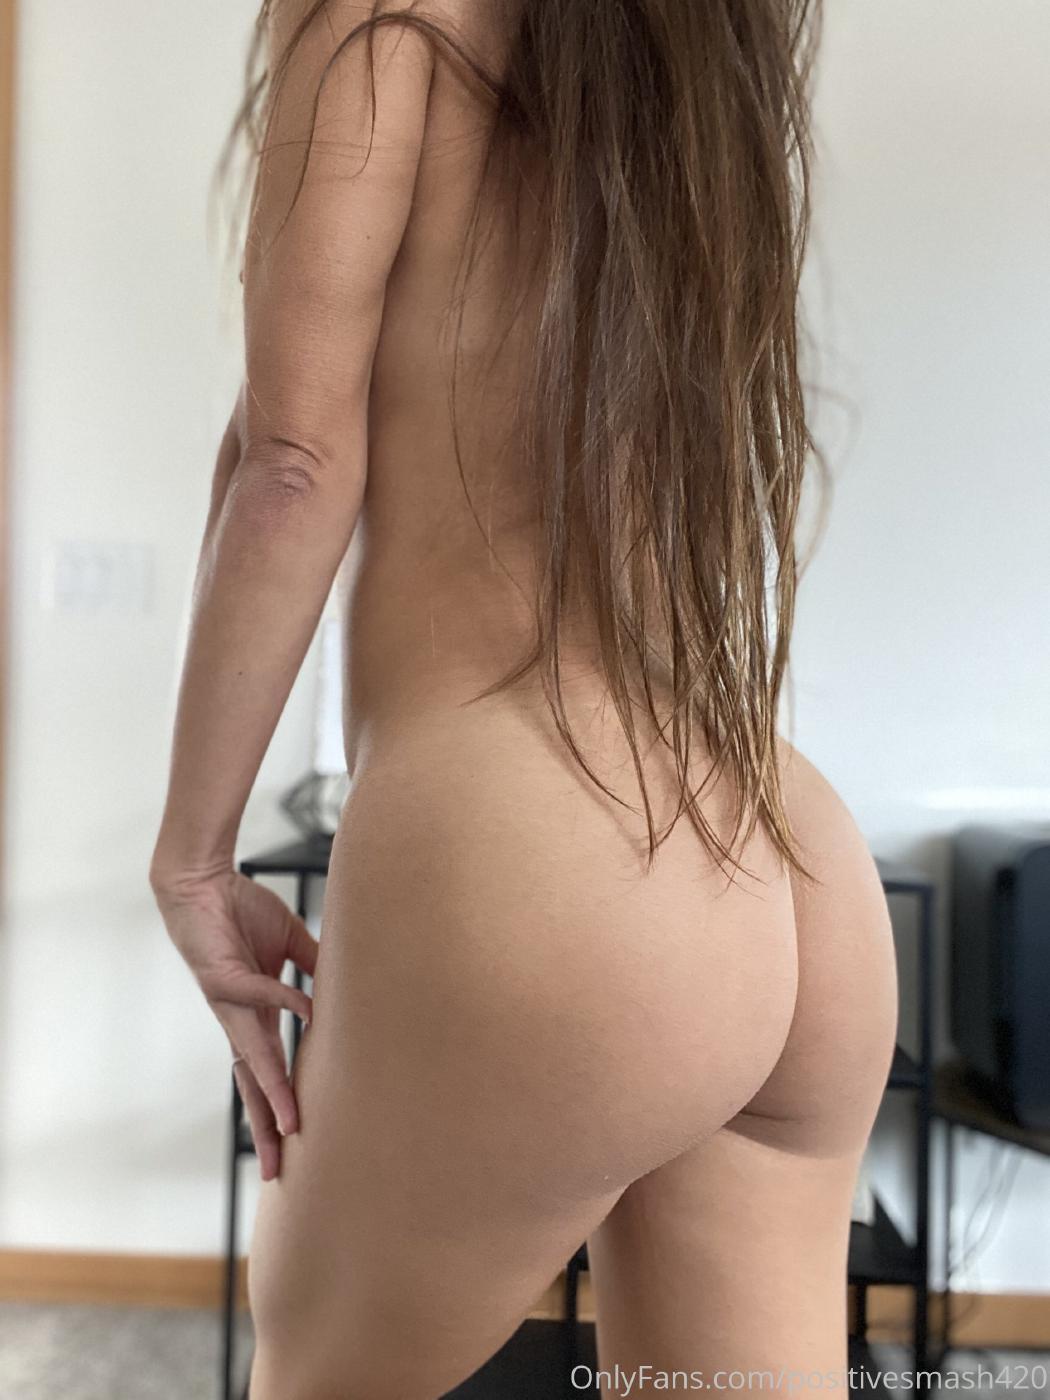 Positive Smash Nude Bikini Strip Onlyfans Set Leaked 0004